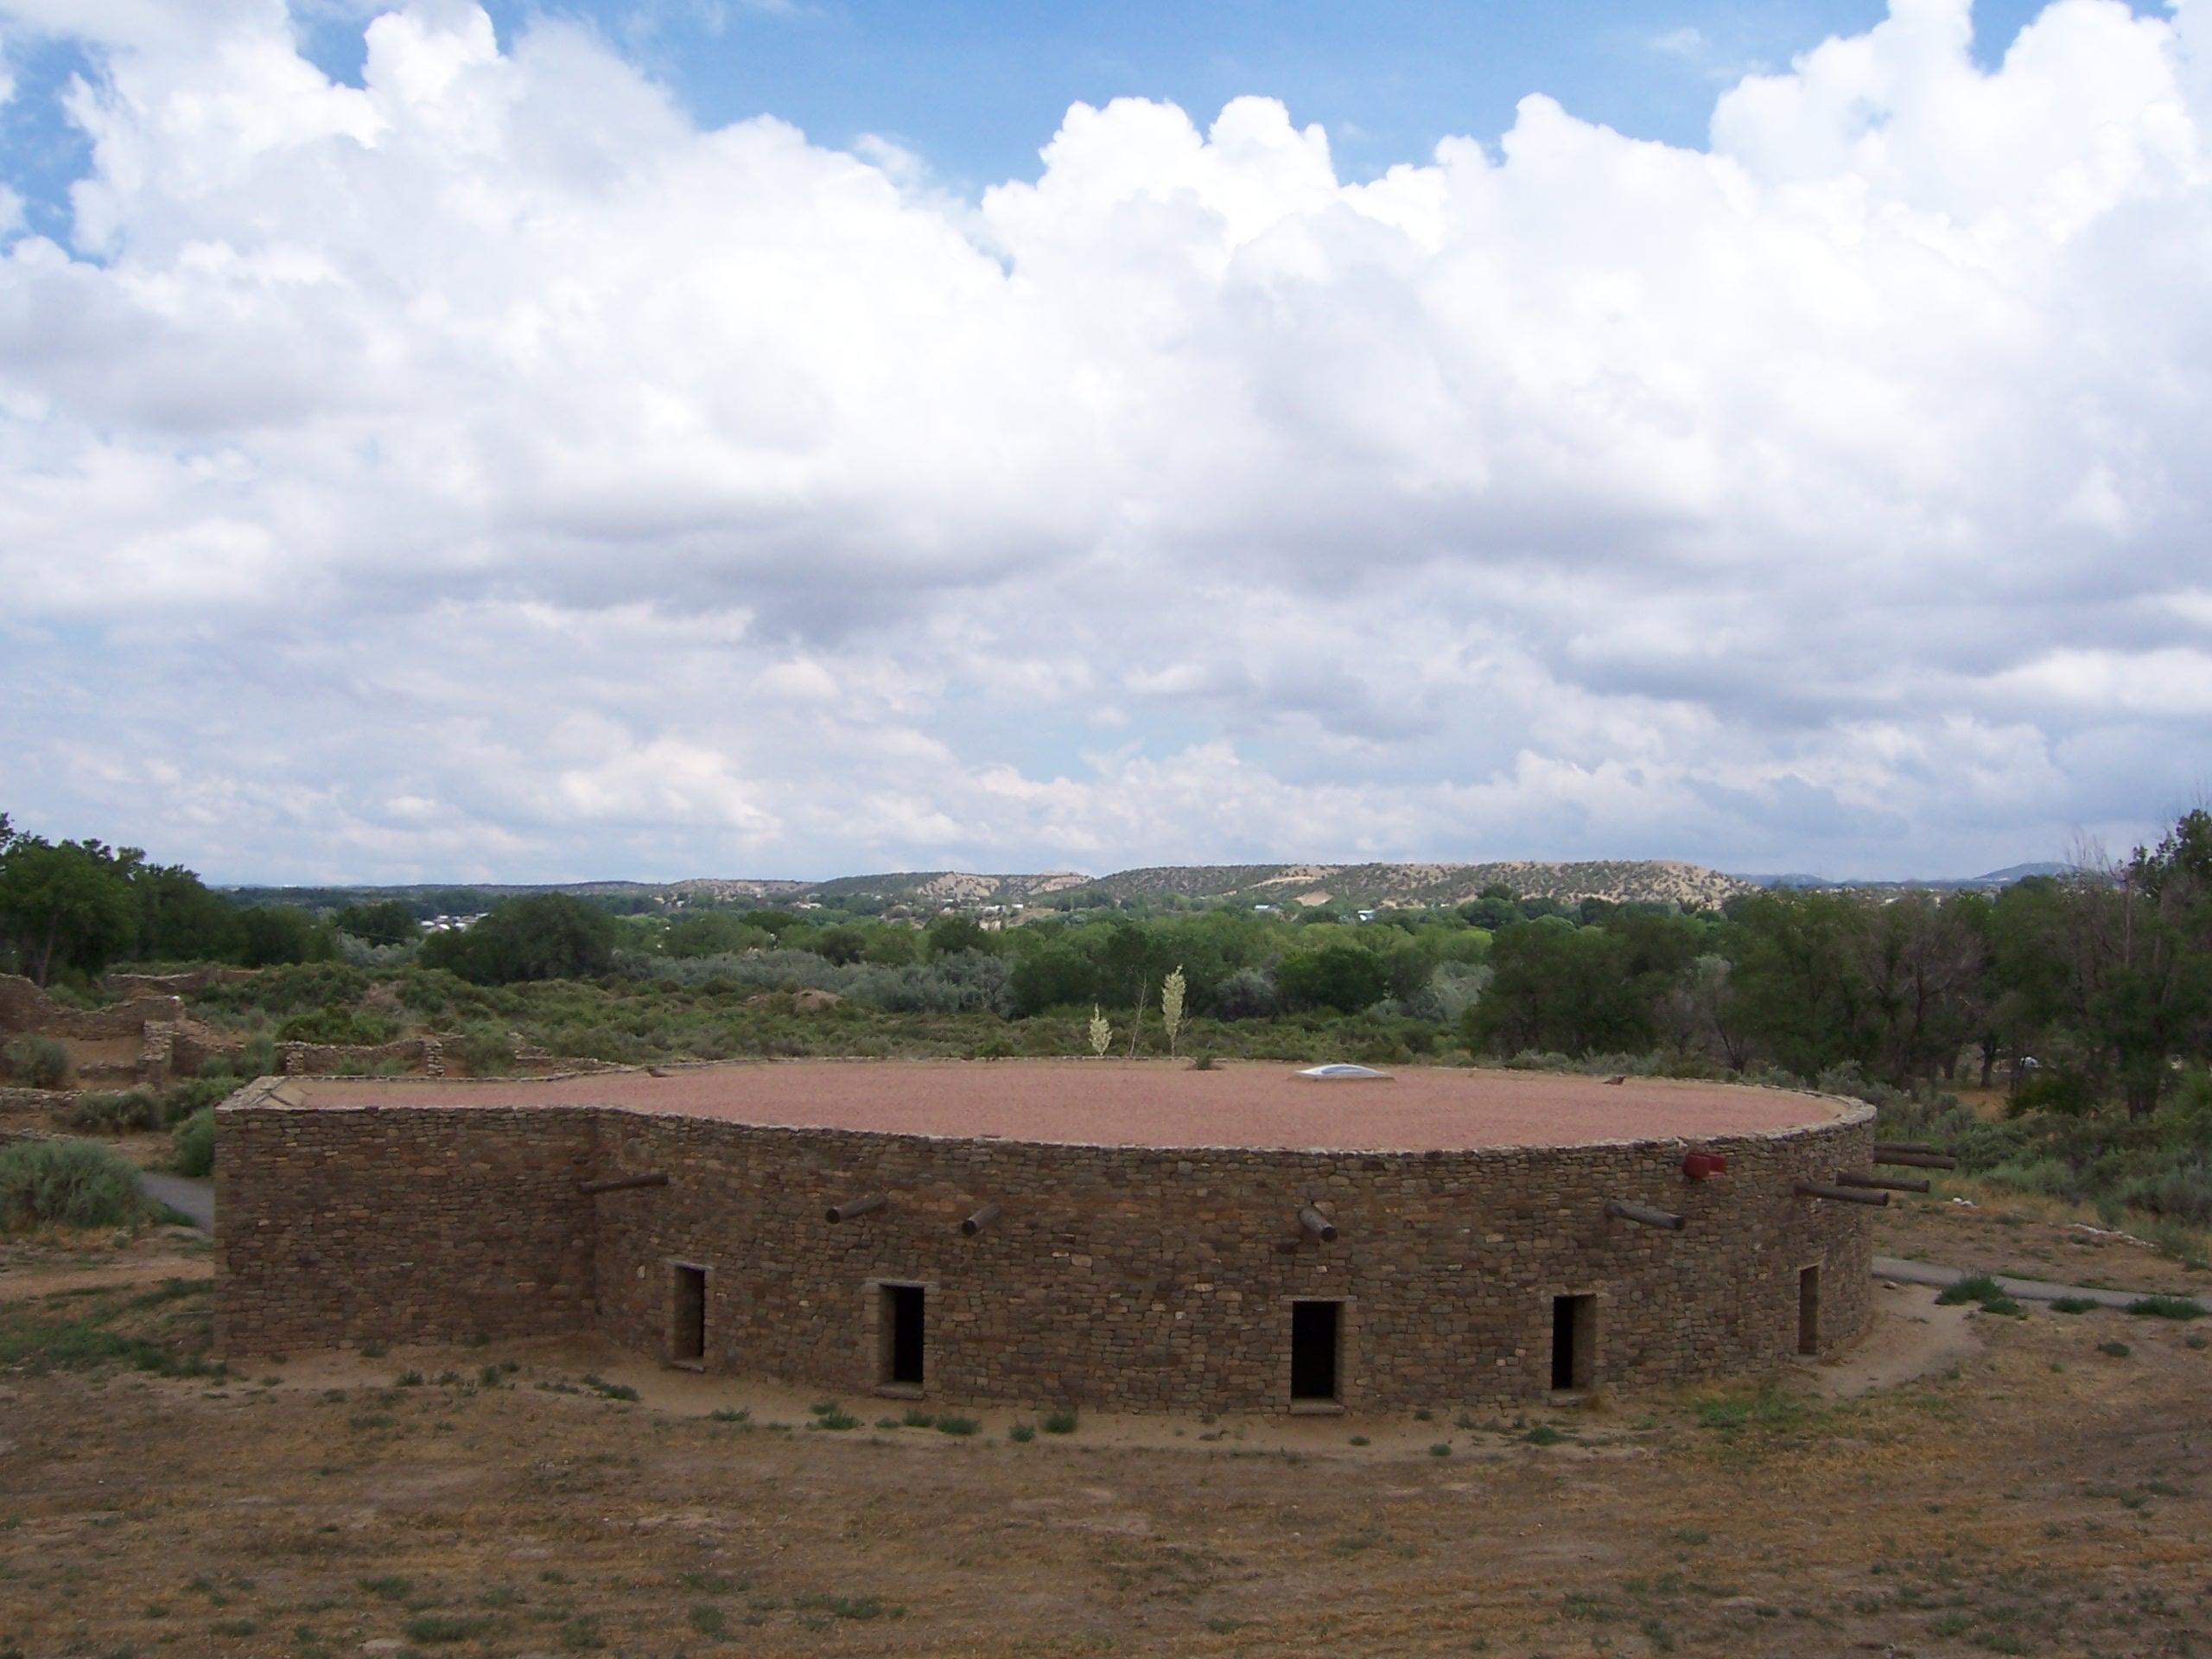 Kiva exterior